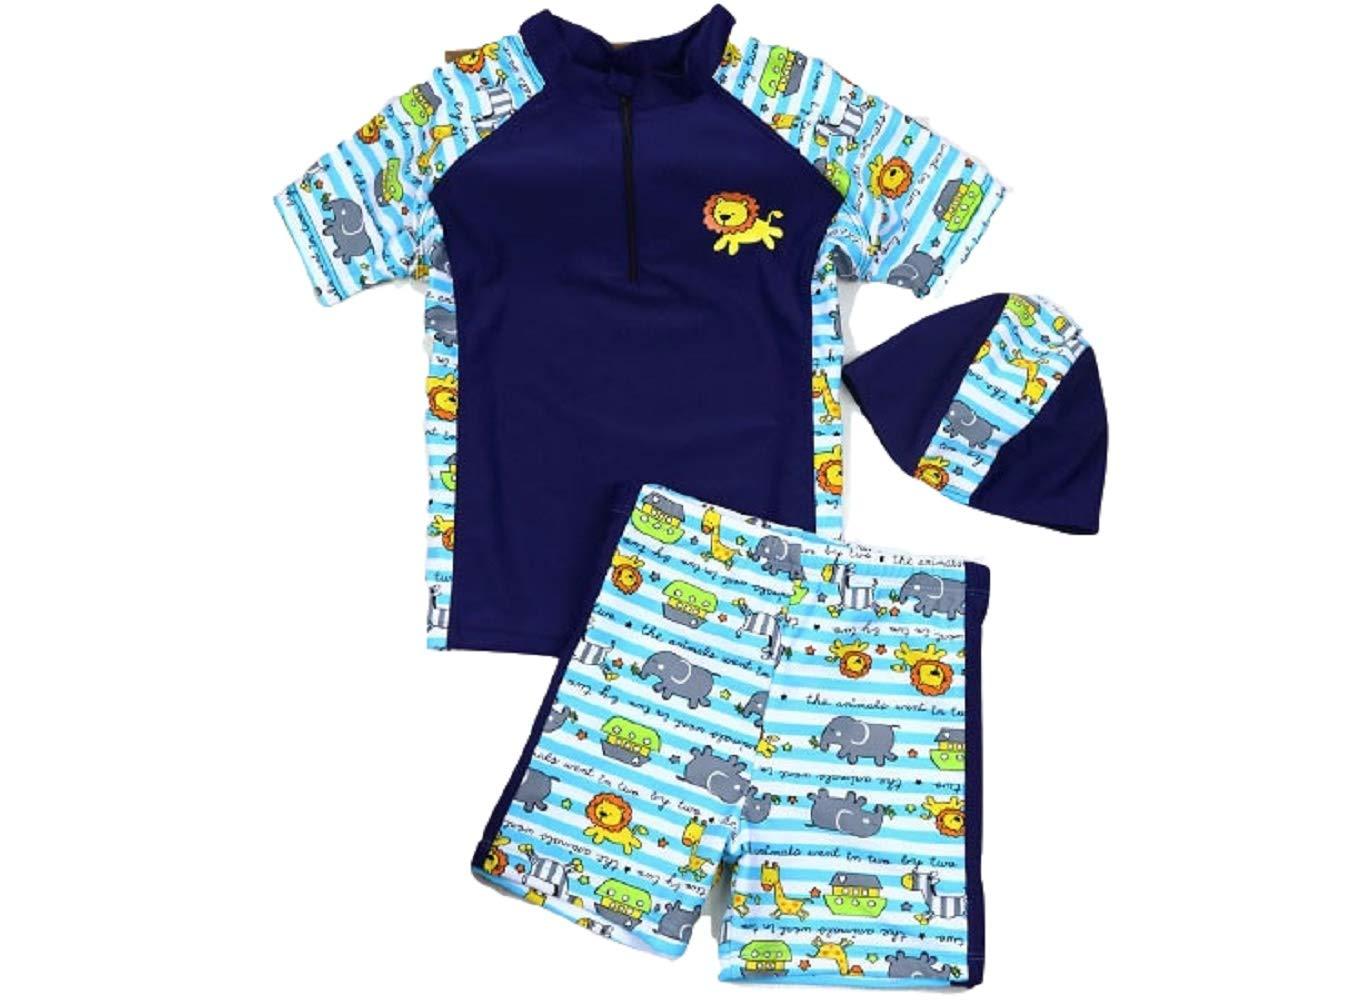 Yunqir Kids Wetsuit 2 Pcs/Set Children's Short Spilt Swimsuits Kids Lions Patterns Sunscreen Wetsuit for Water Sports(Navy)